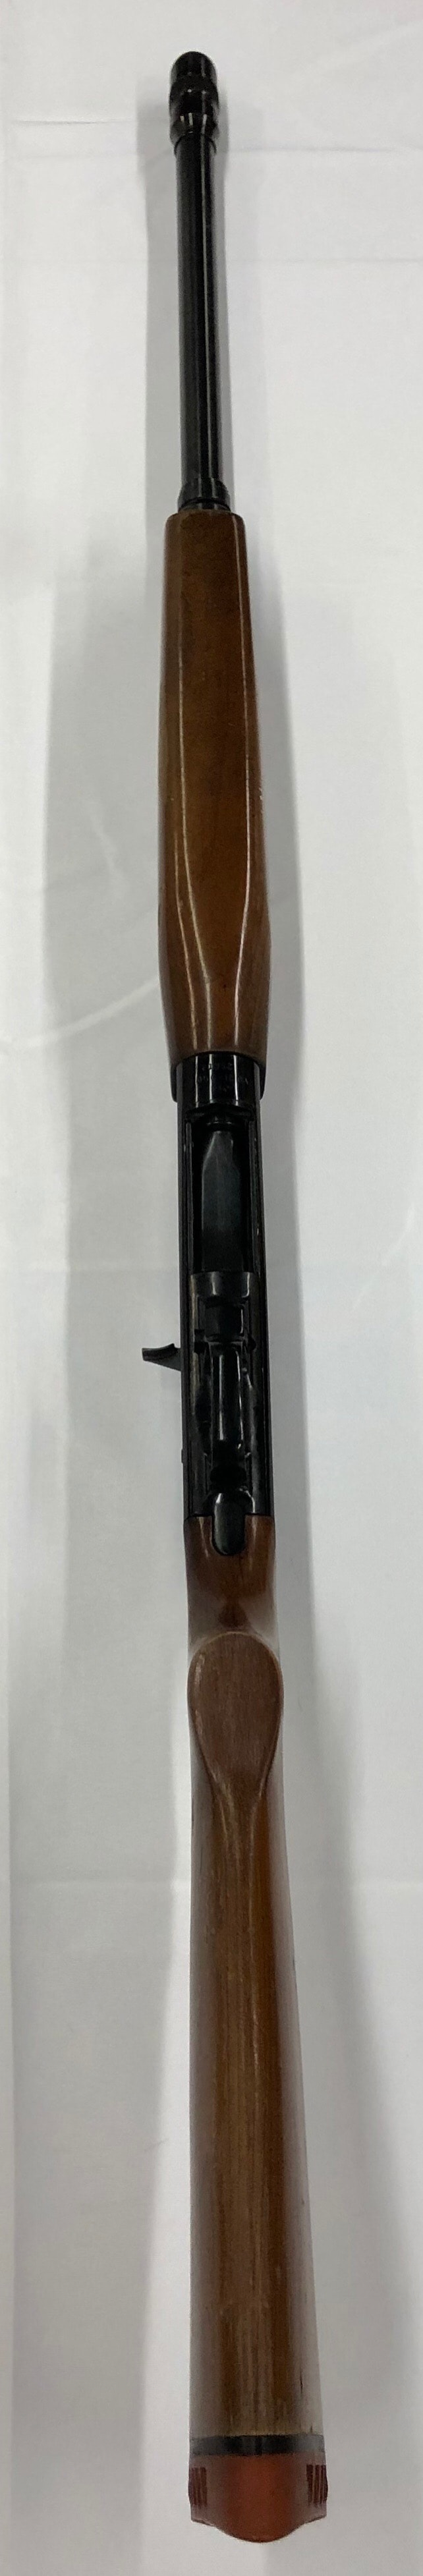 SEARS ROEBUCK AND CO. Model 300